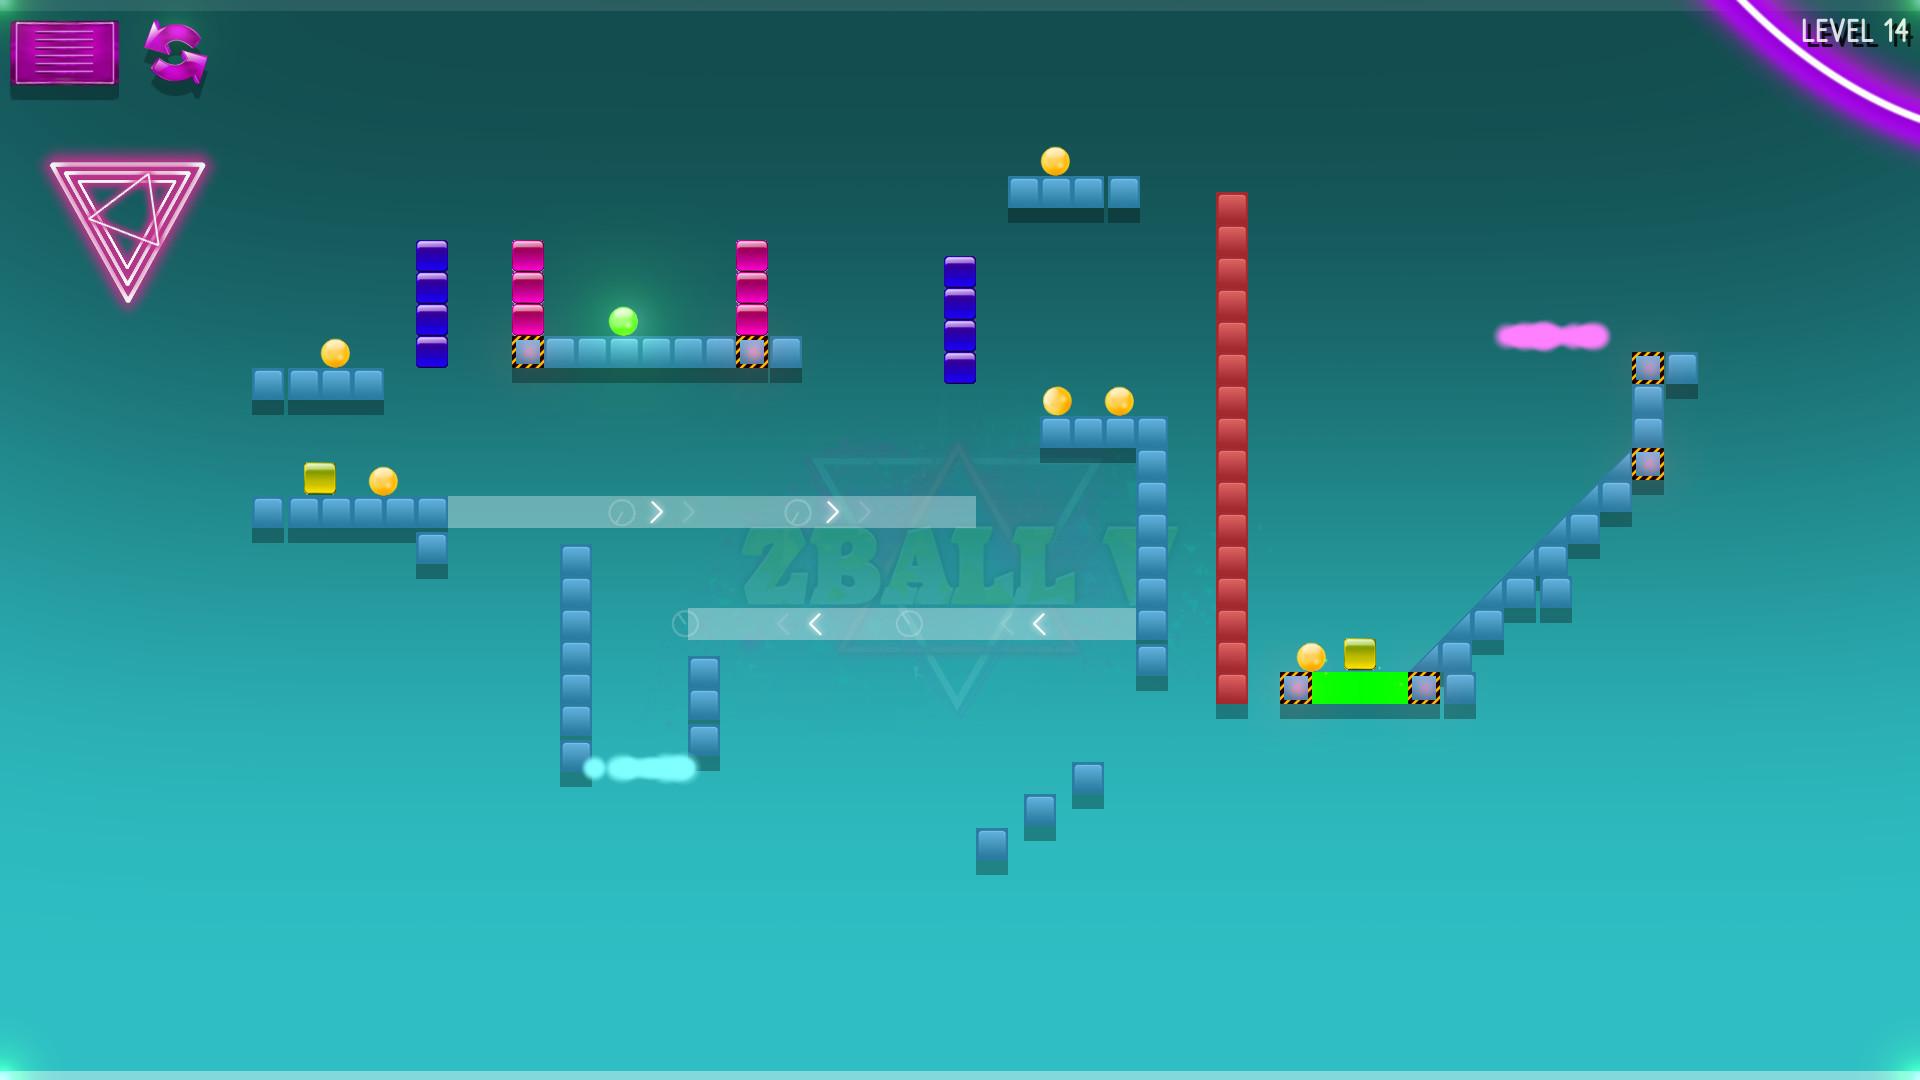 Zball V screenshot